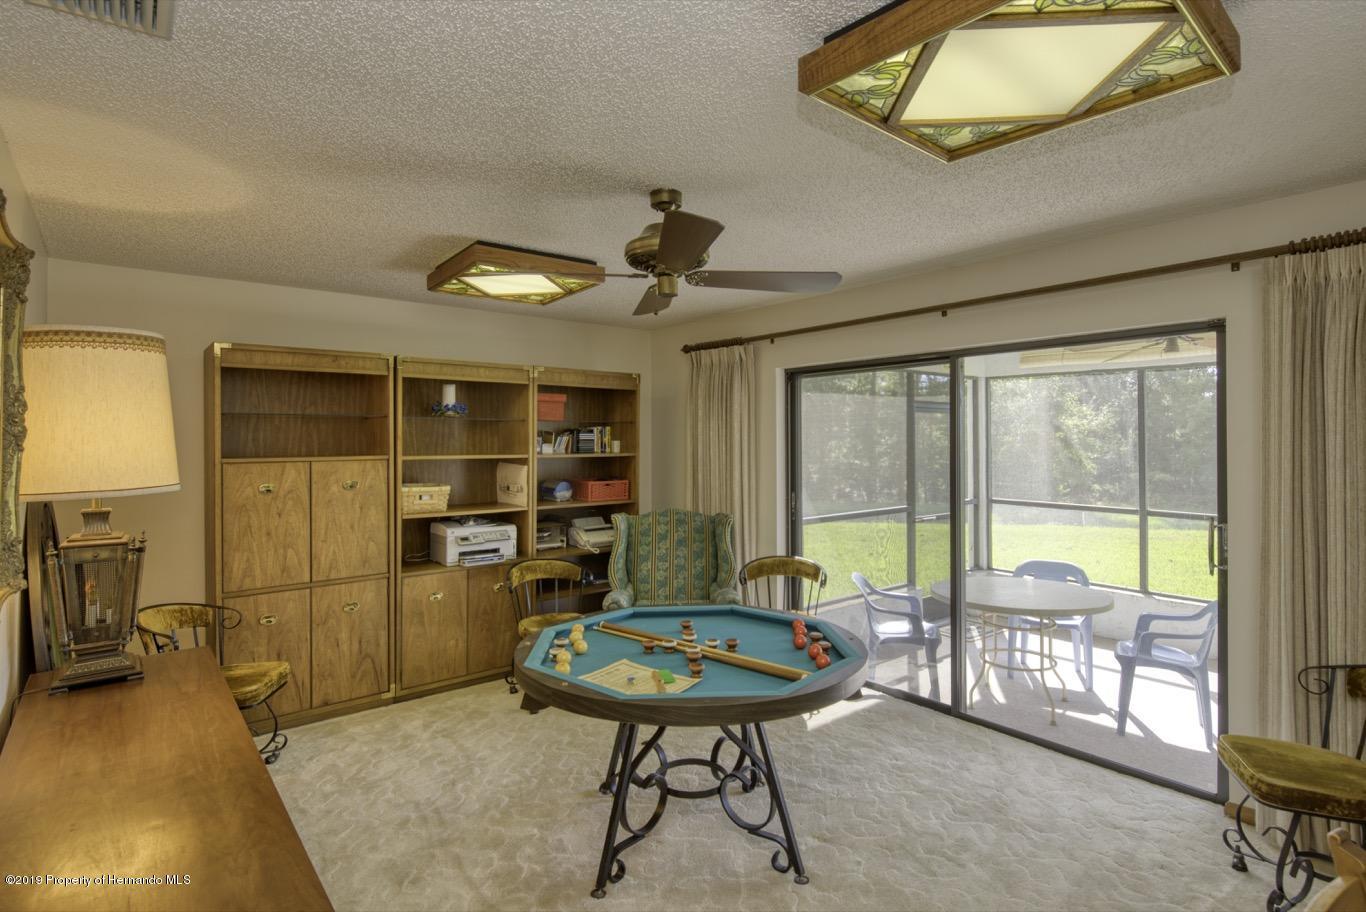 57 Golfview Court, Homosassa, Florida 34446, 4 Bedrooms Bedrooms, ,3 BathroomsBathrooms,Residential,For Sale,Golfview,2204538